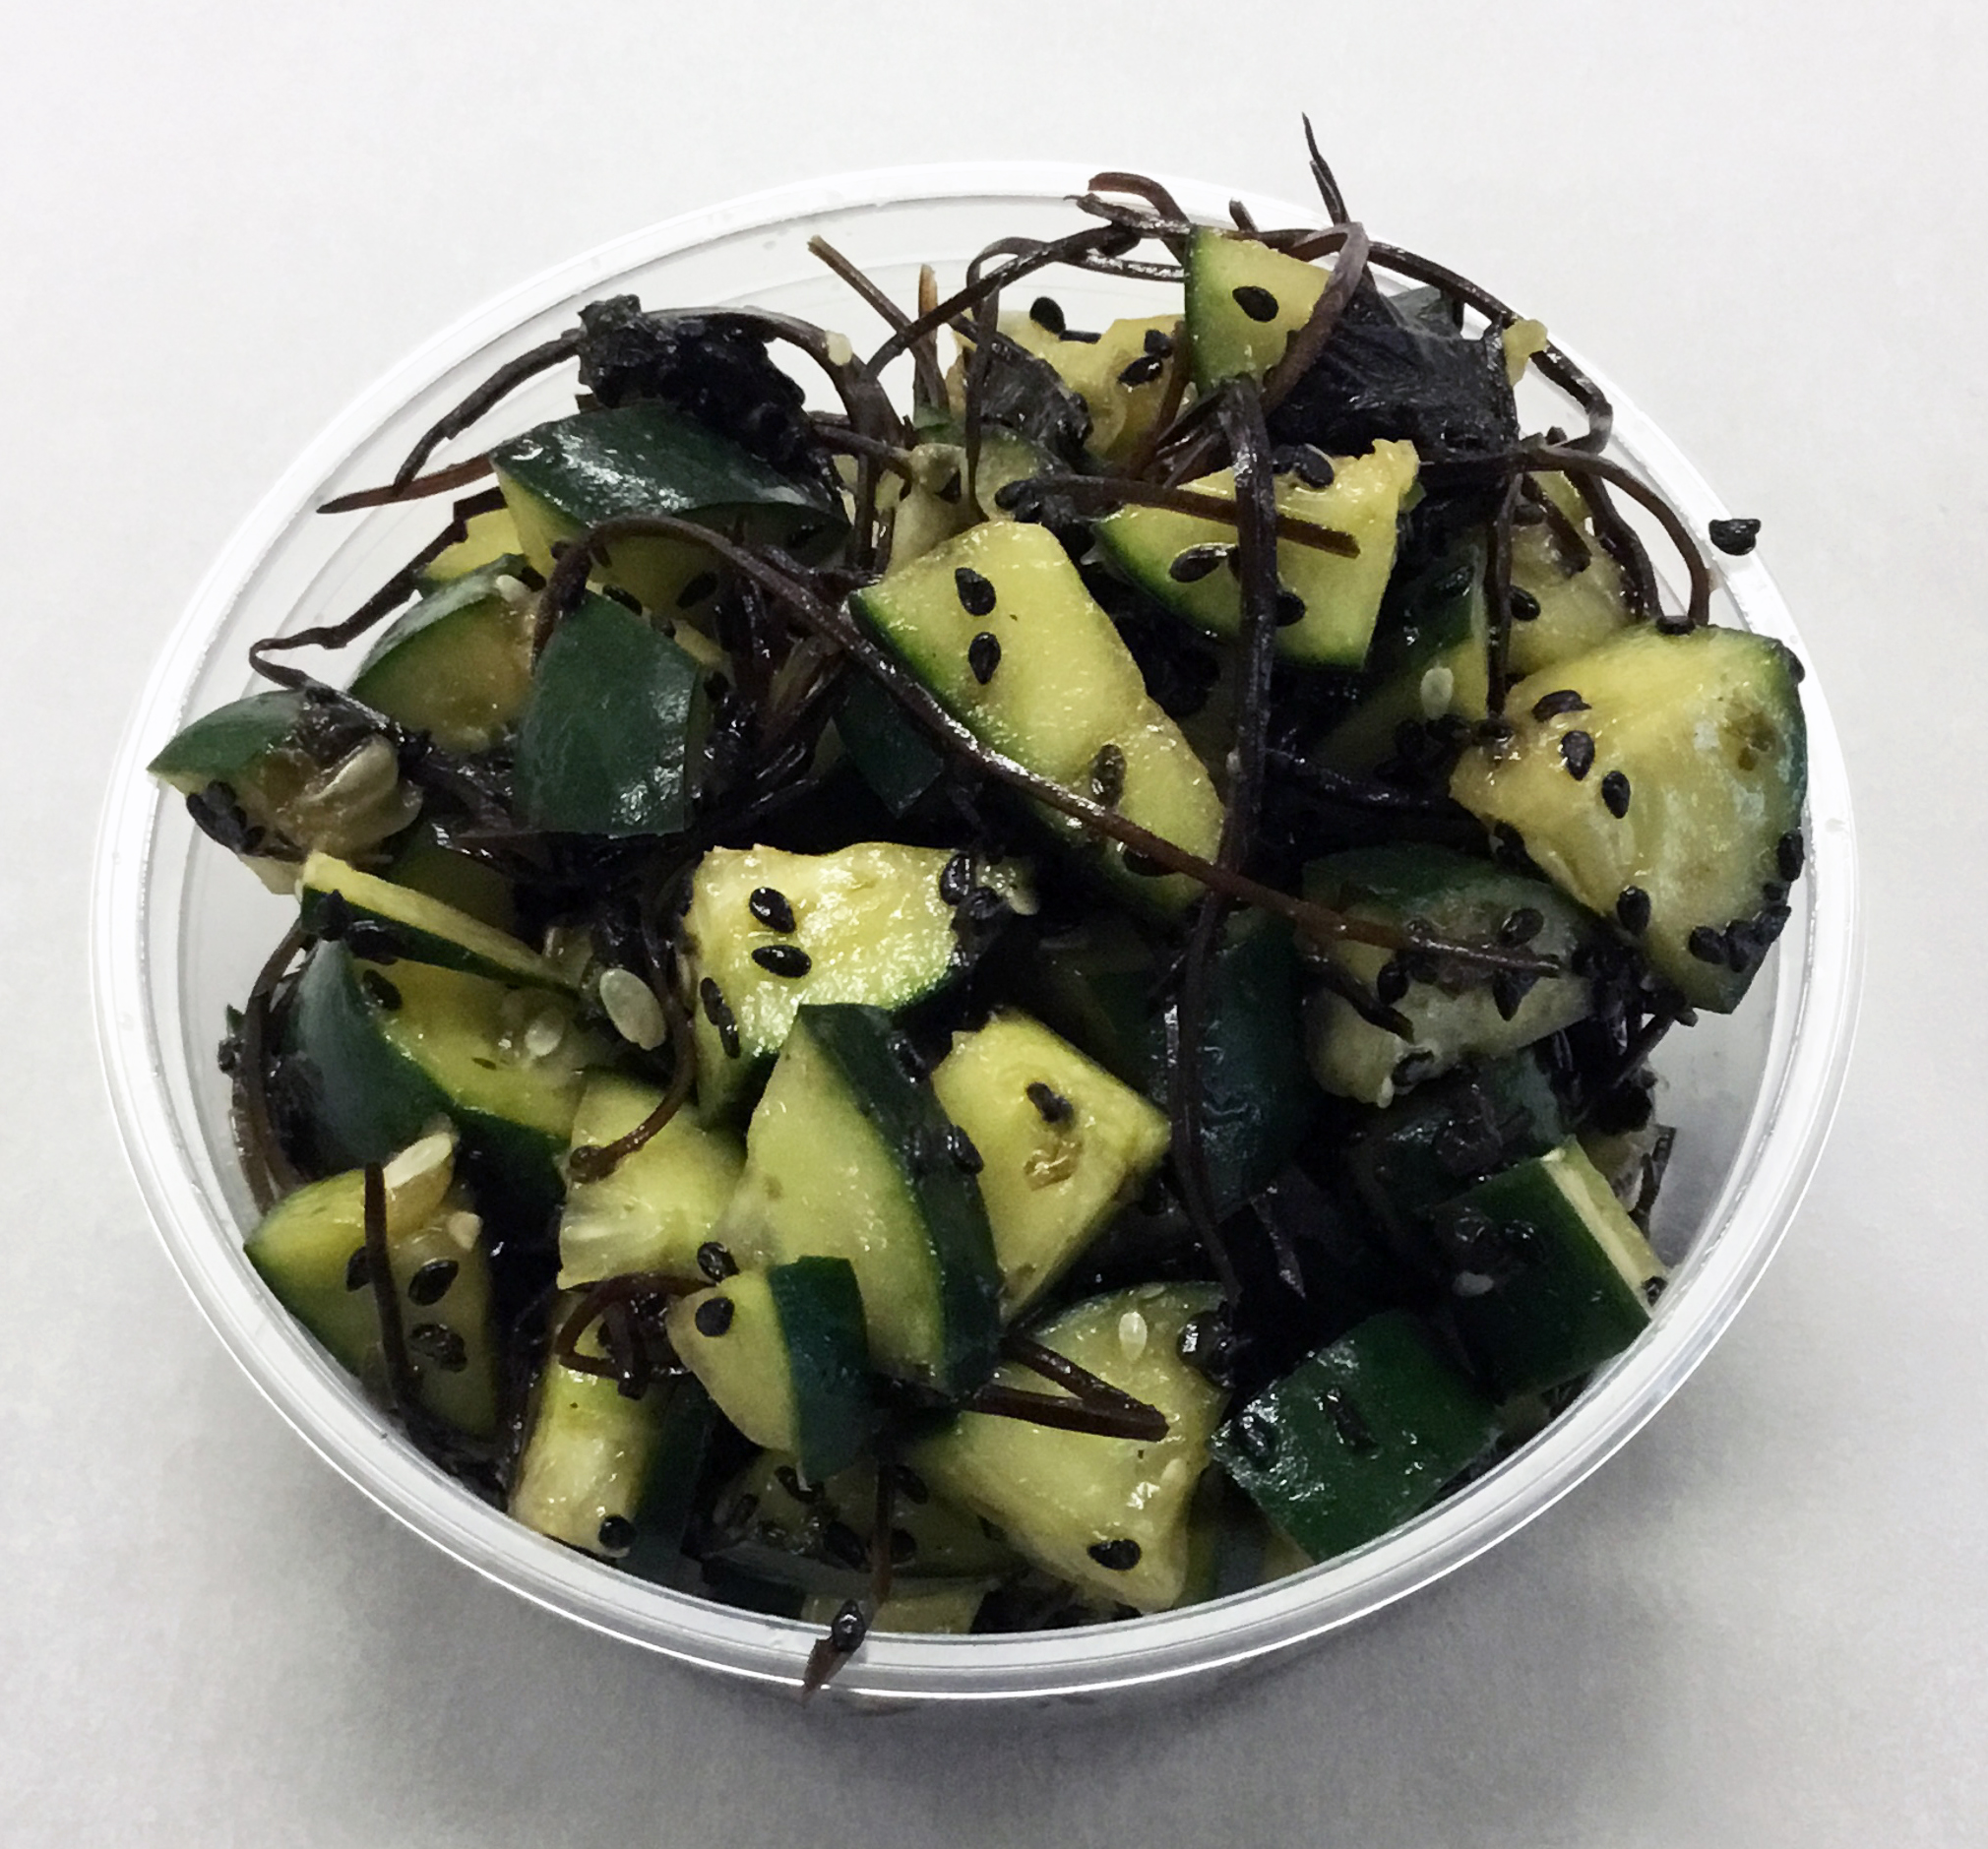 Cucumber, arame (seaweed), wakame (seaweed), black sesame seed and tamari.